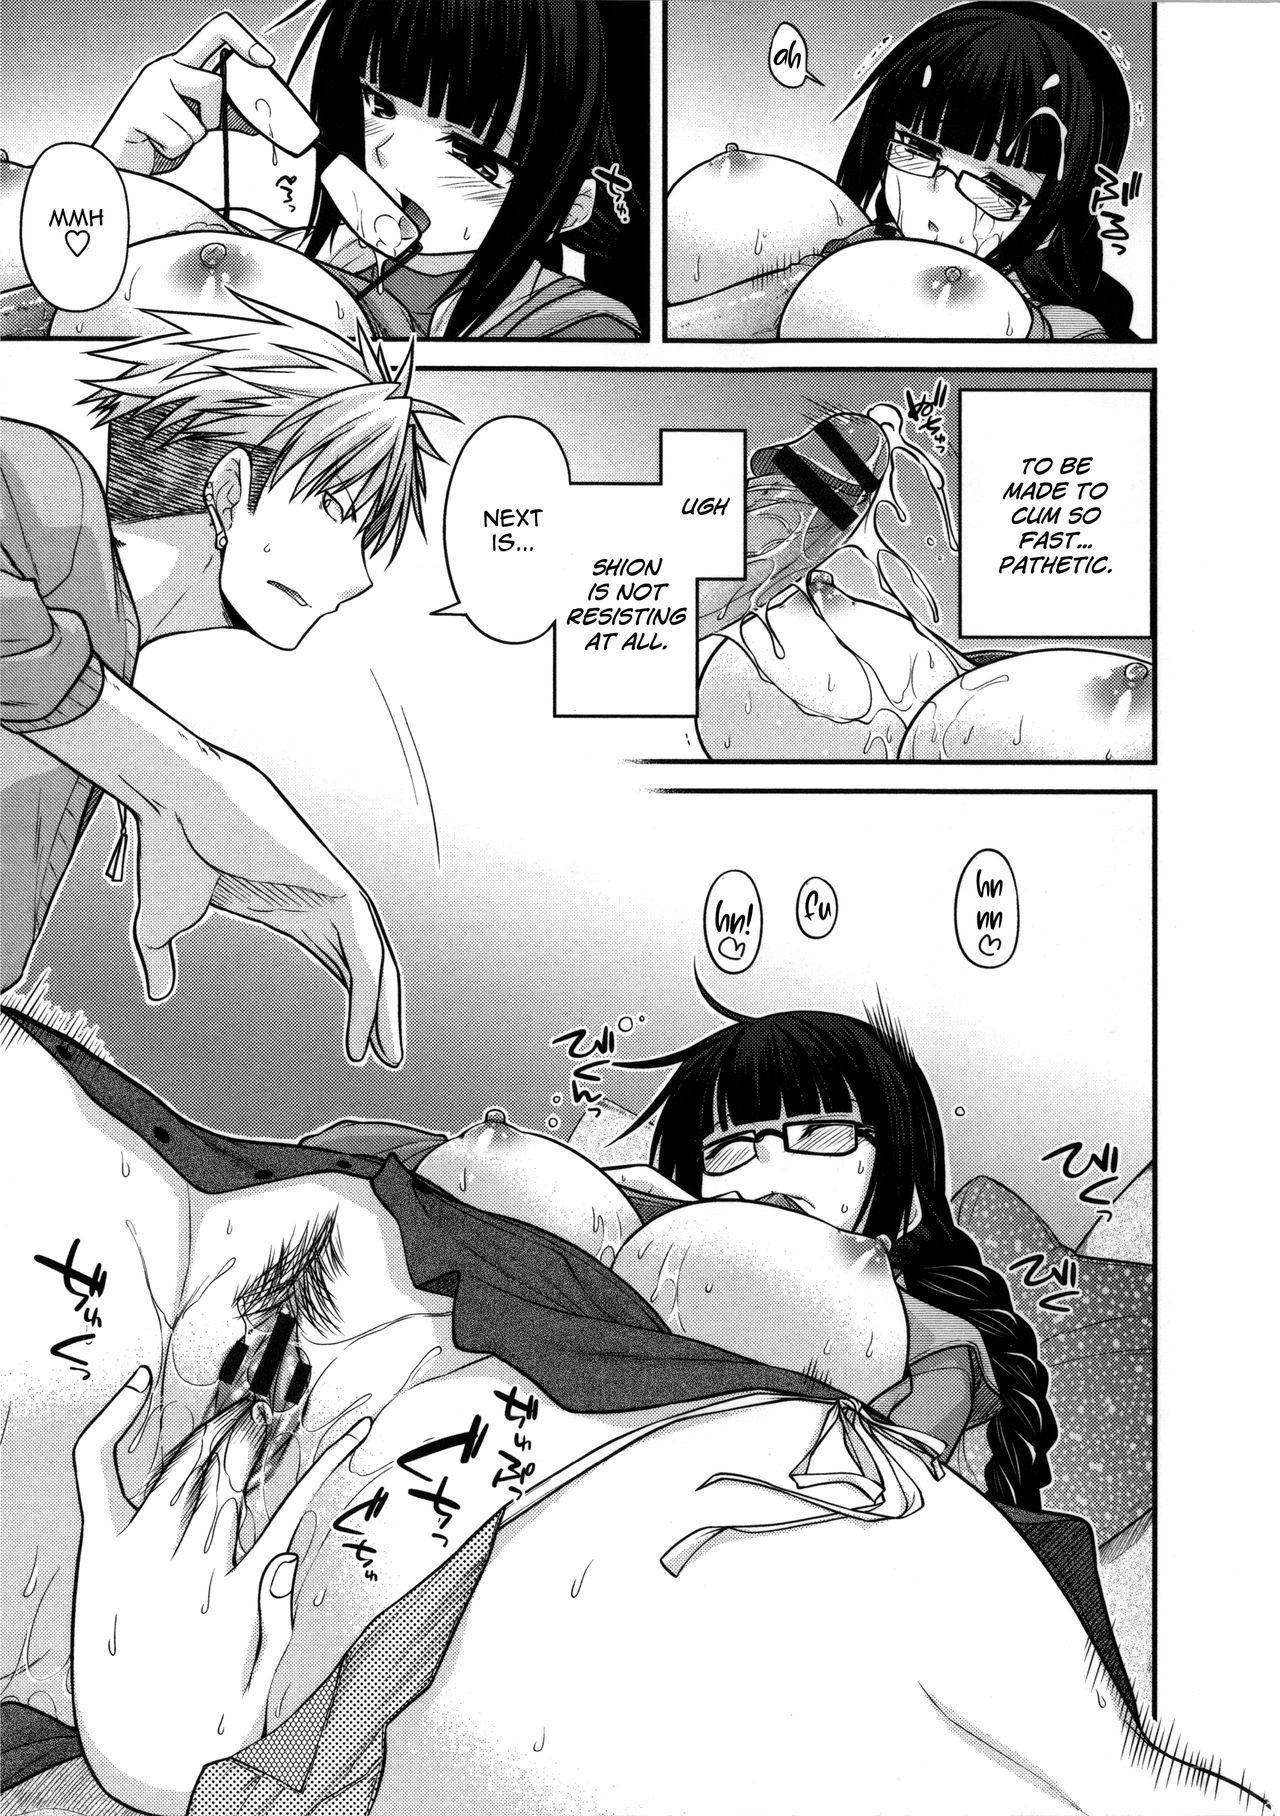 [Miyashiro Sousuke] Yamato Nadeshiko Chichi Henge - Yamato Nadeshiko Breast Changes Ch. 0-1, 4-5, 7-9 [English] 33